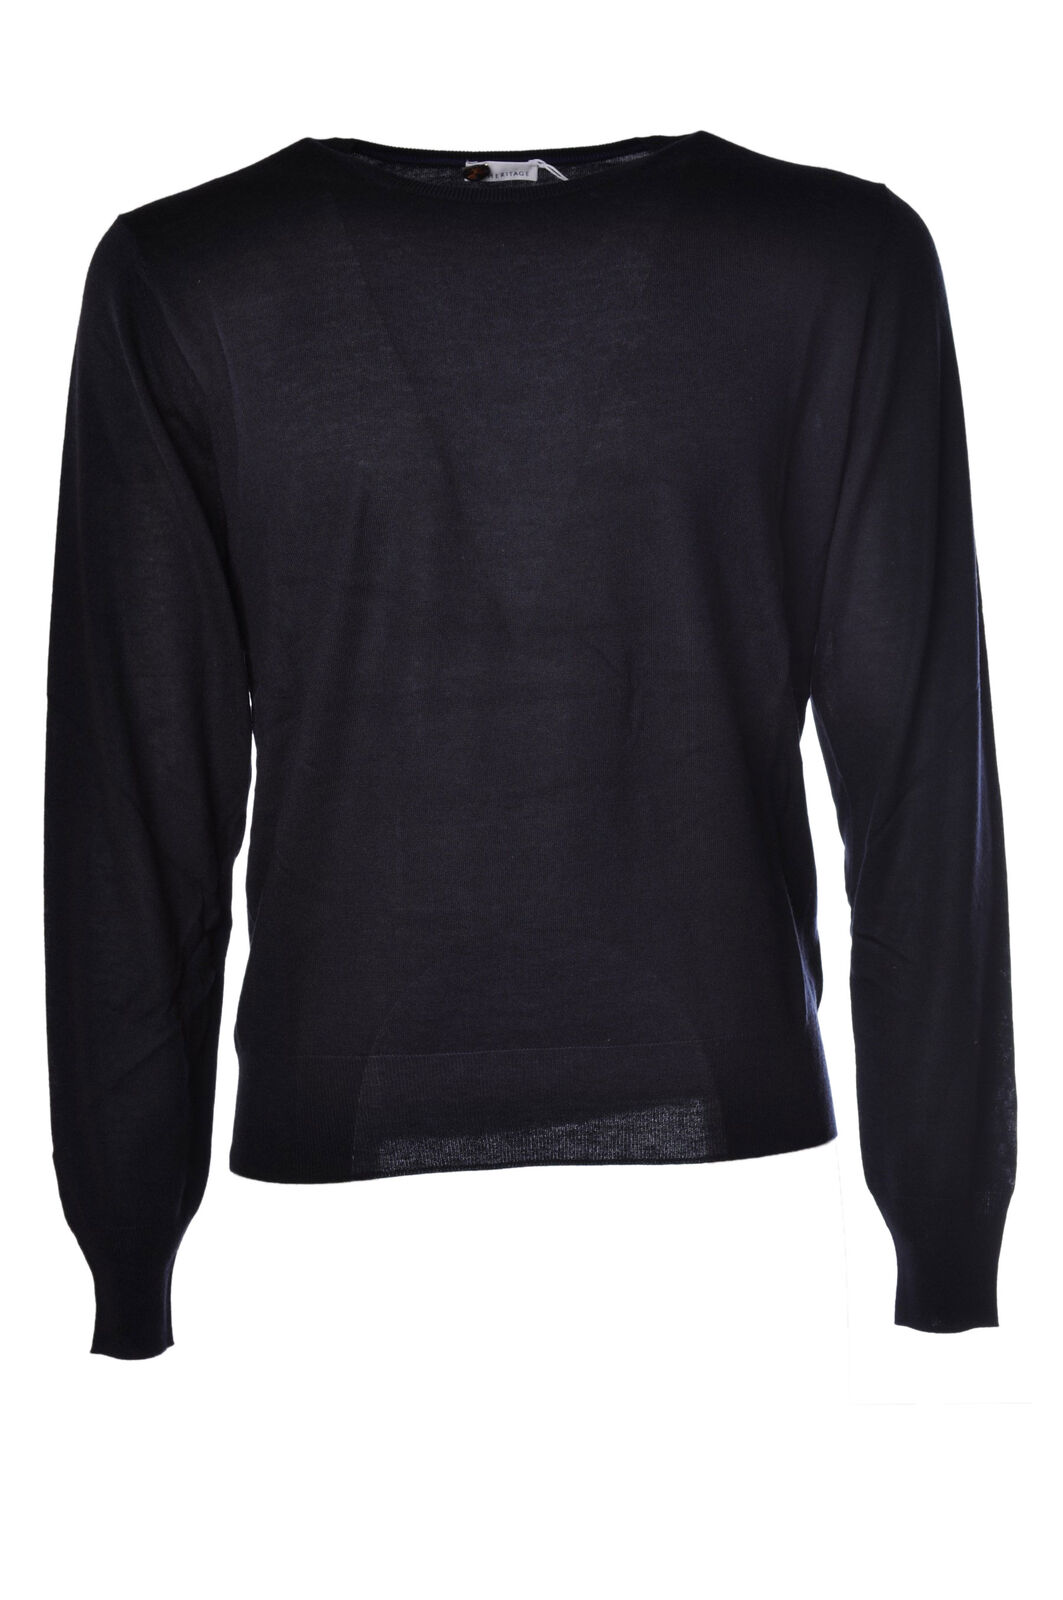 Heritage - Knitwear-Sweaters - Man - Blau - 939818C183741